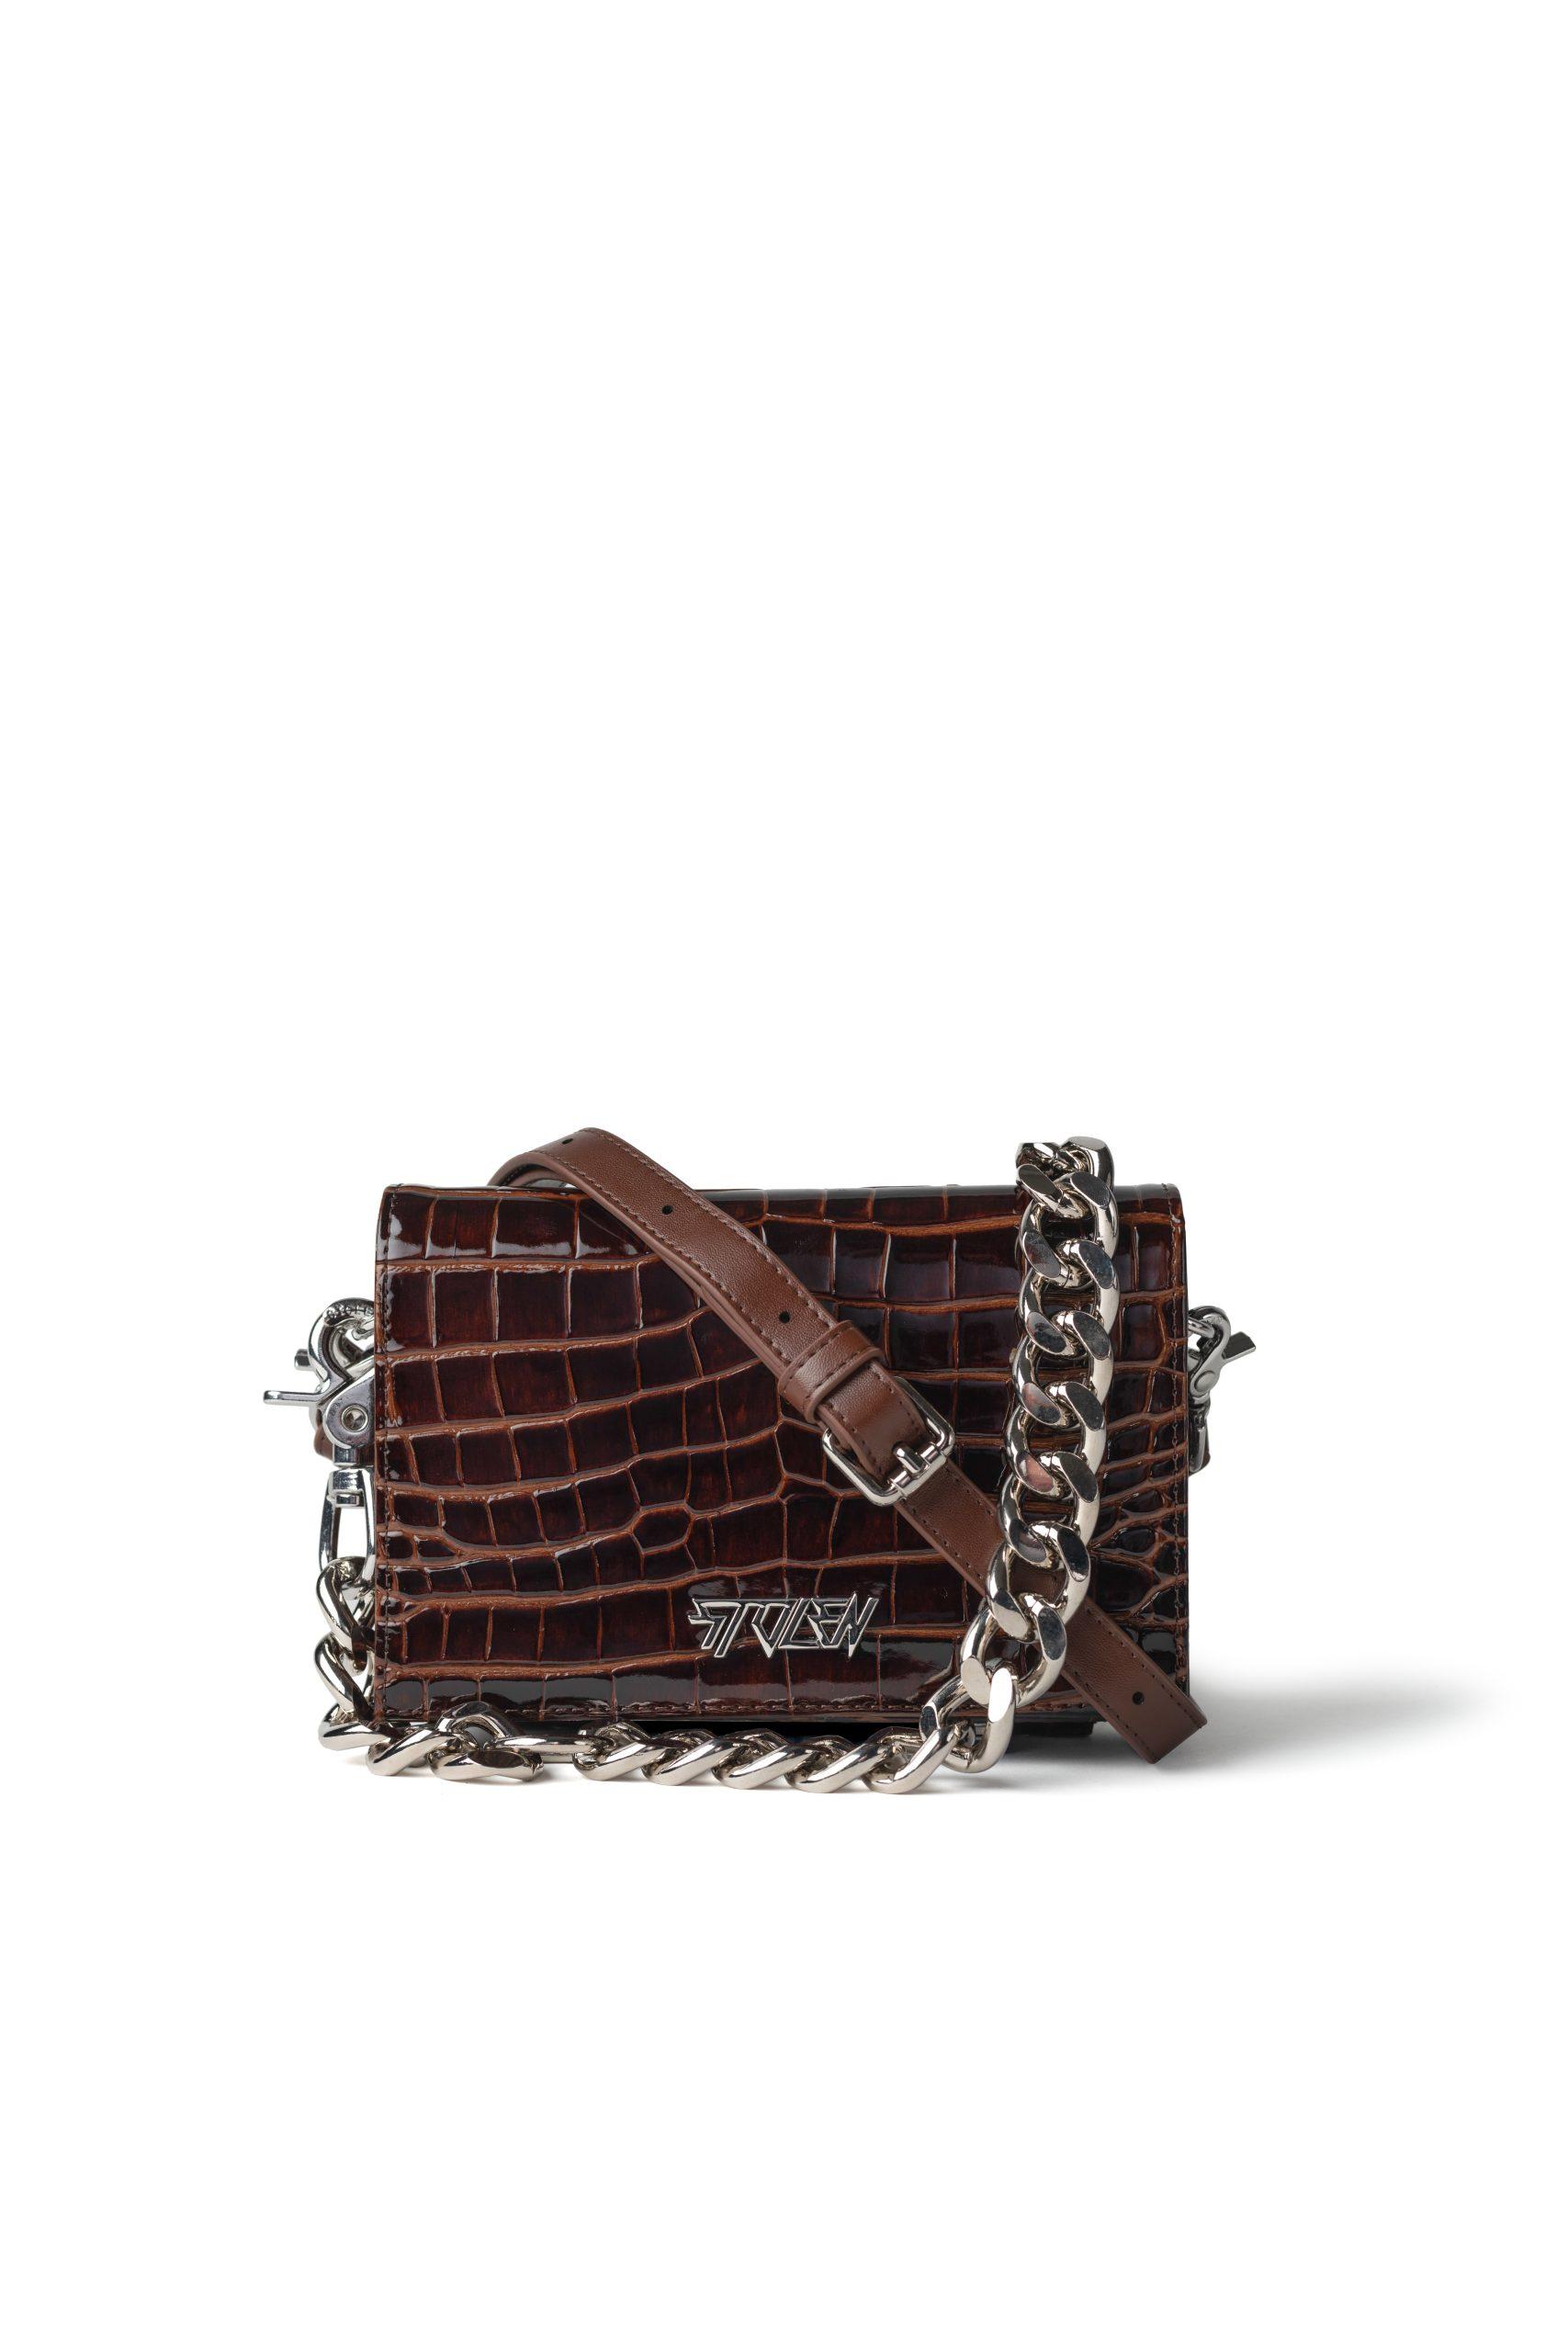 B043 Little Trouble Bag Auburn RRP $379